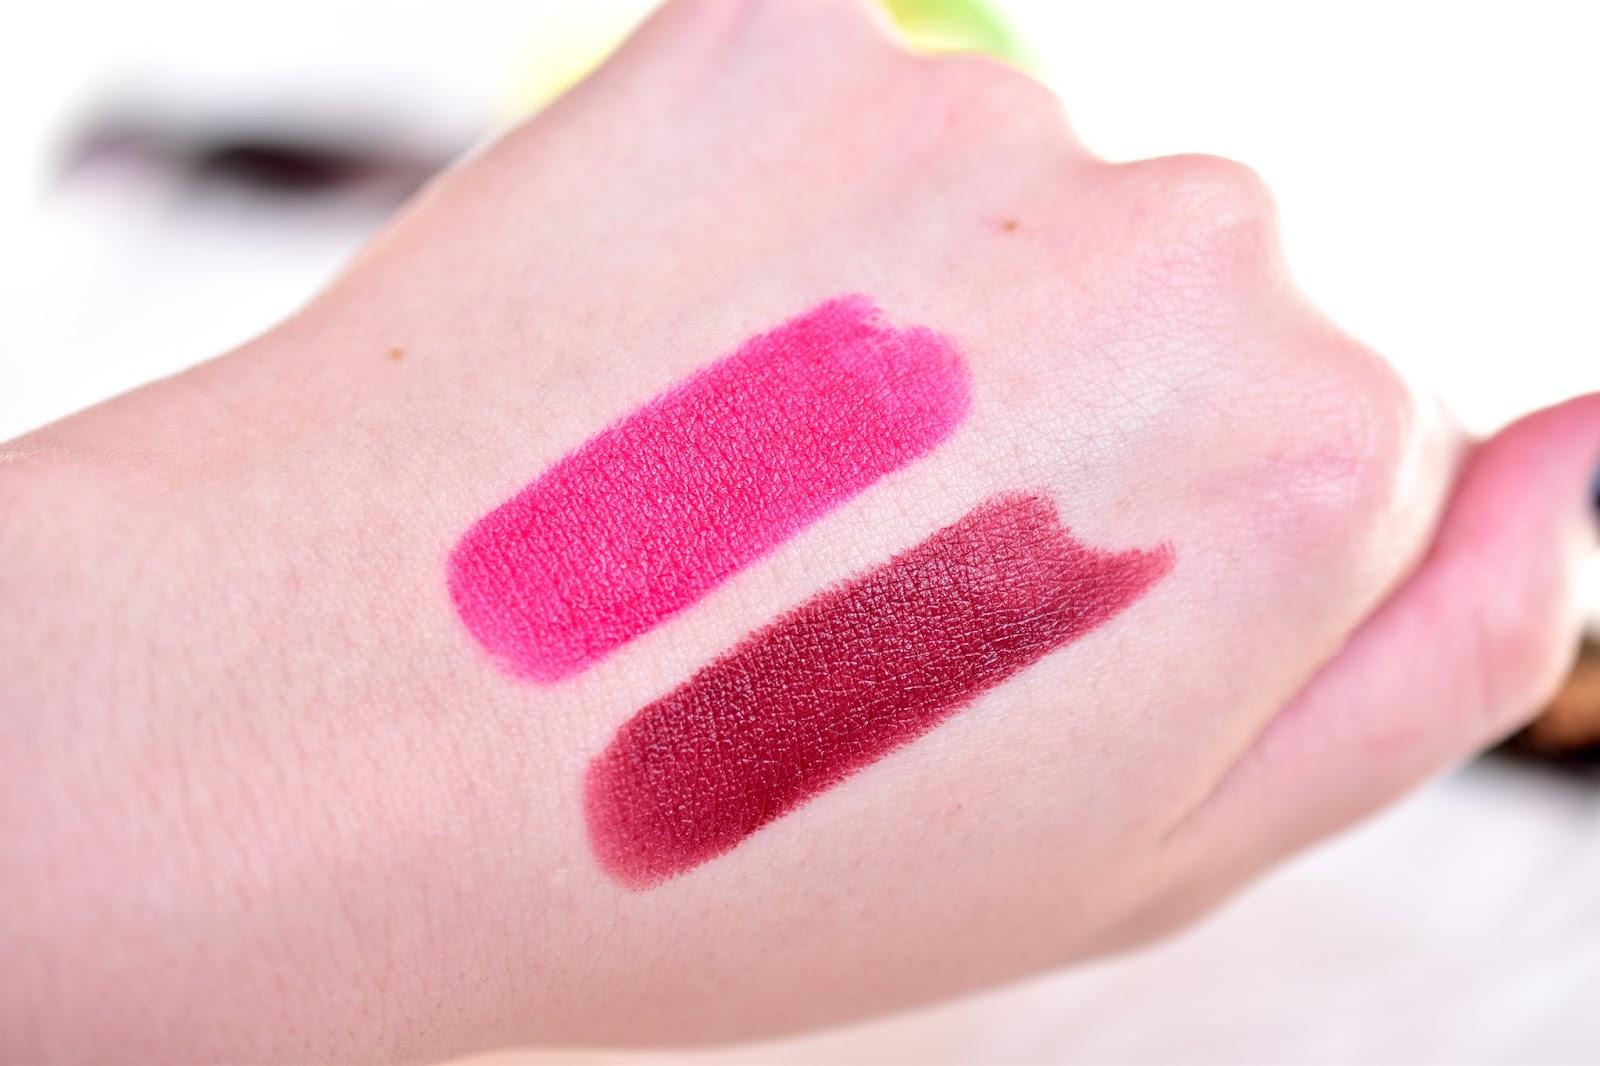 dermacol pretty matte lipstick swatche 07 a 17